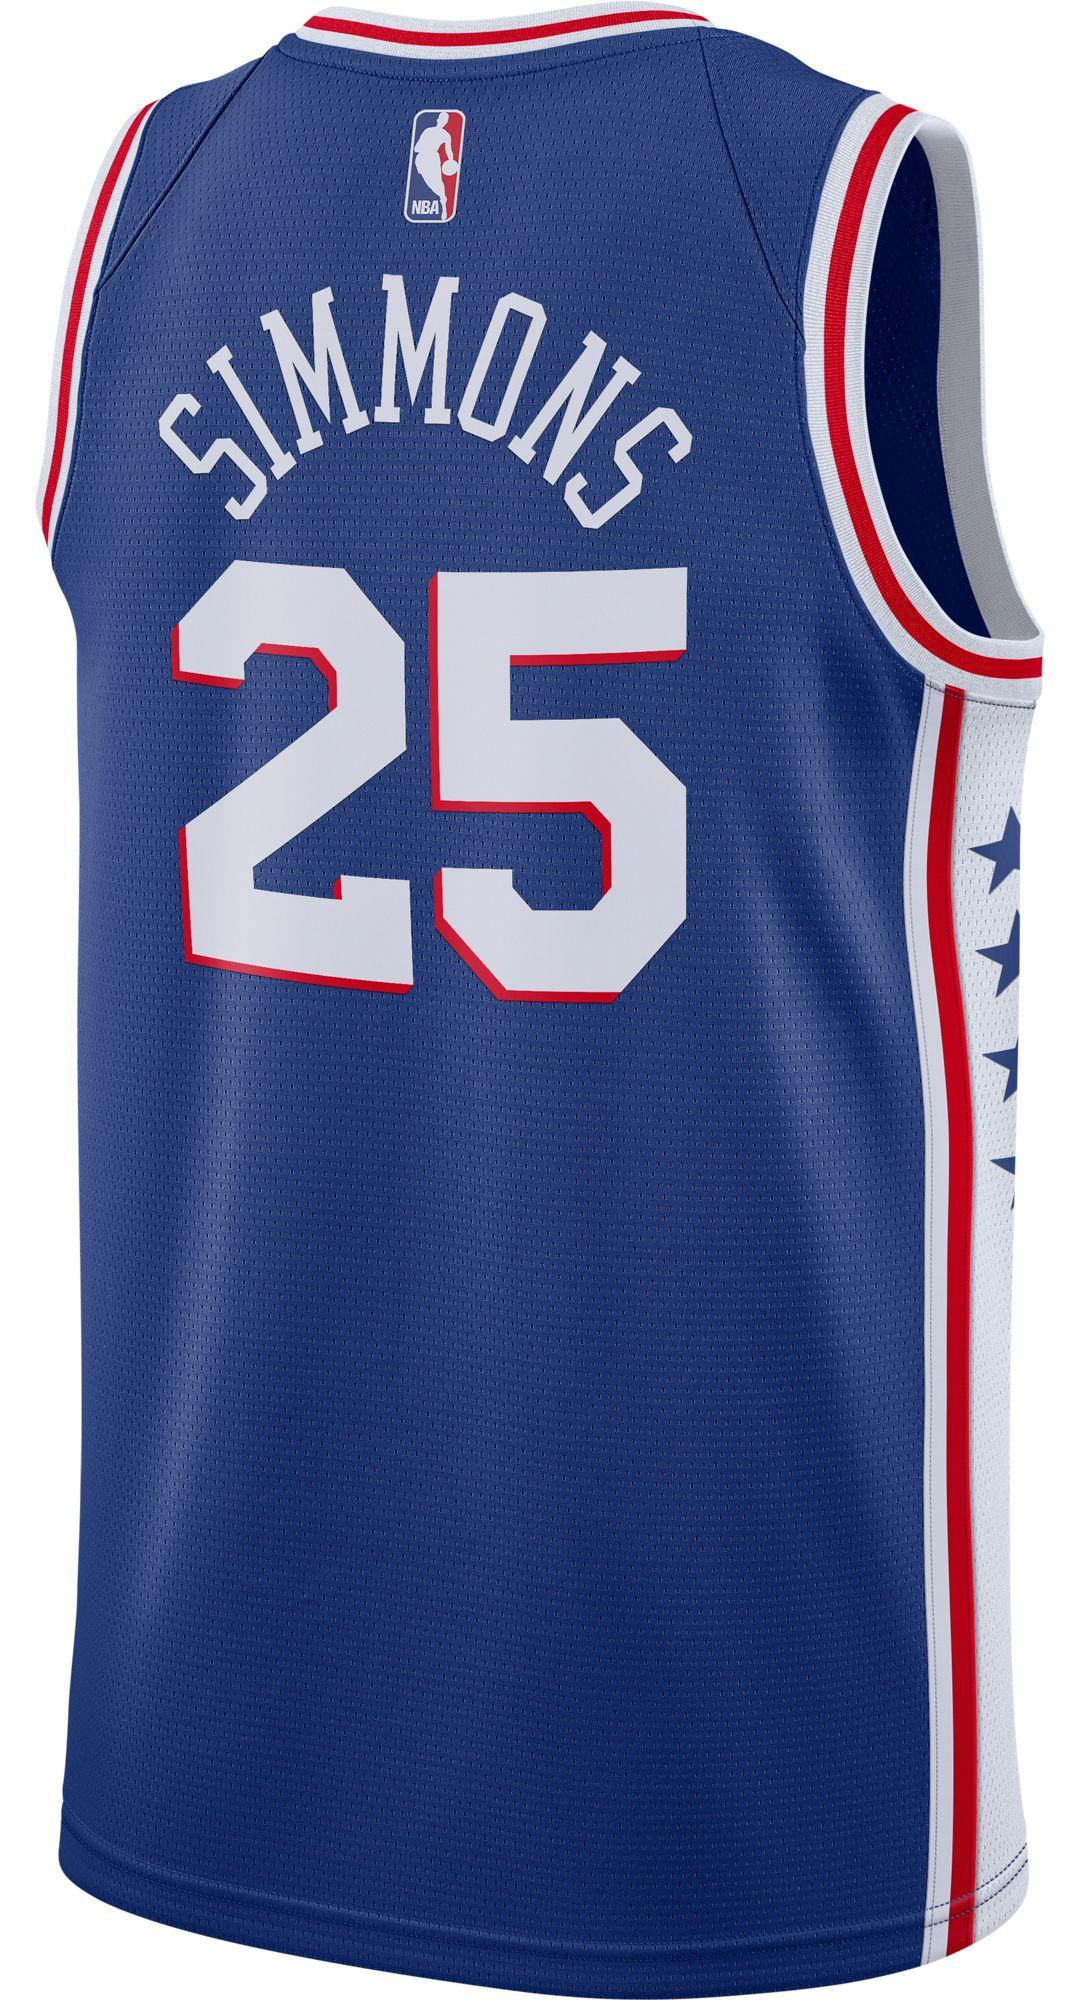 new arrival 578c3 79d7d Nike Men's Philadelphia 76ers Ben Simmons #25 Royal Dri-FIT Swingman Jersey